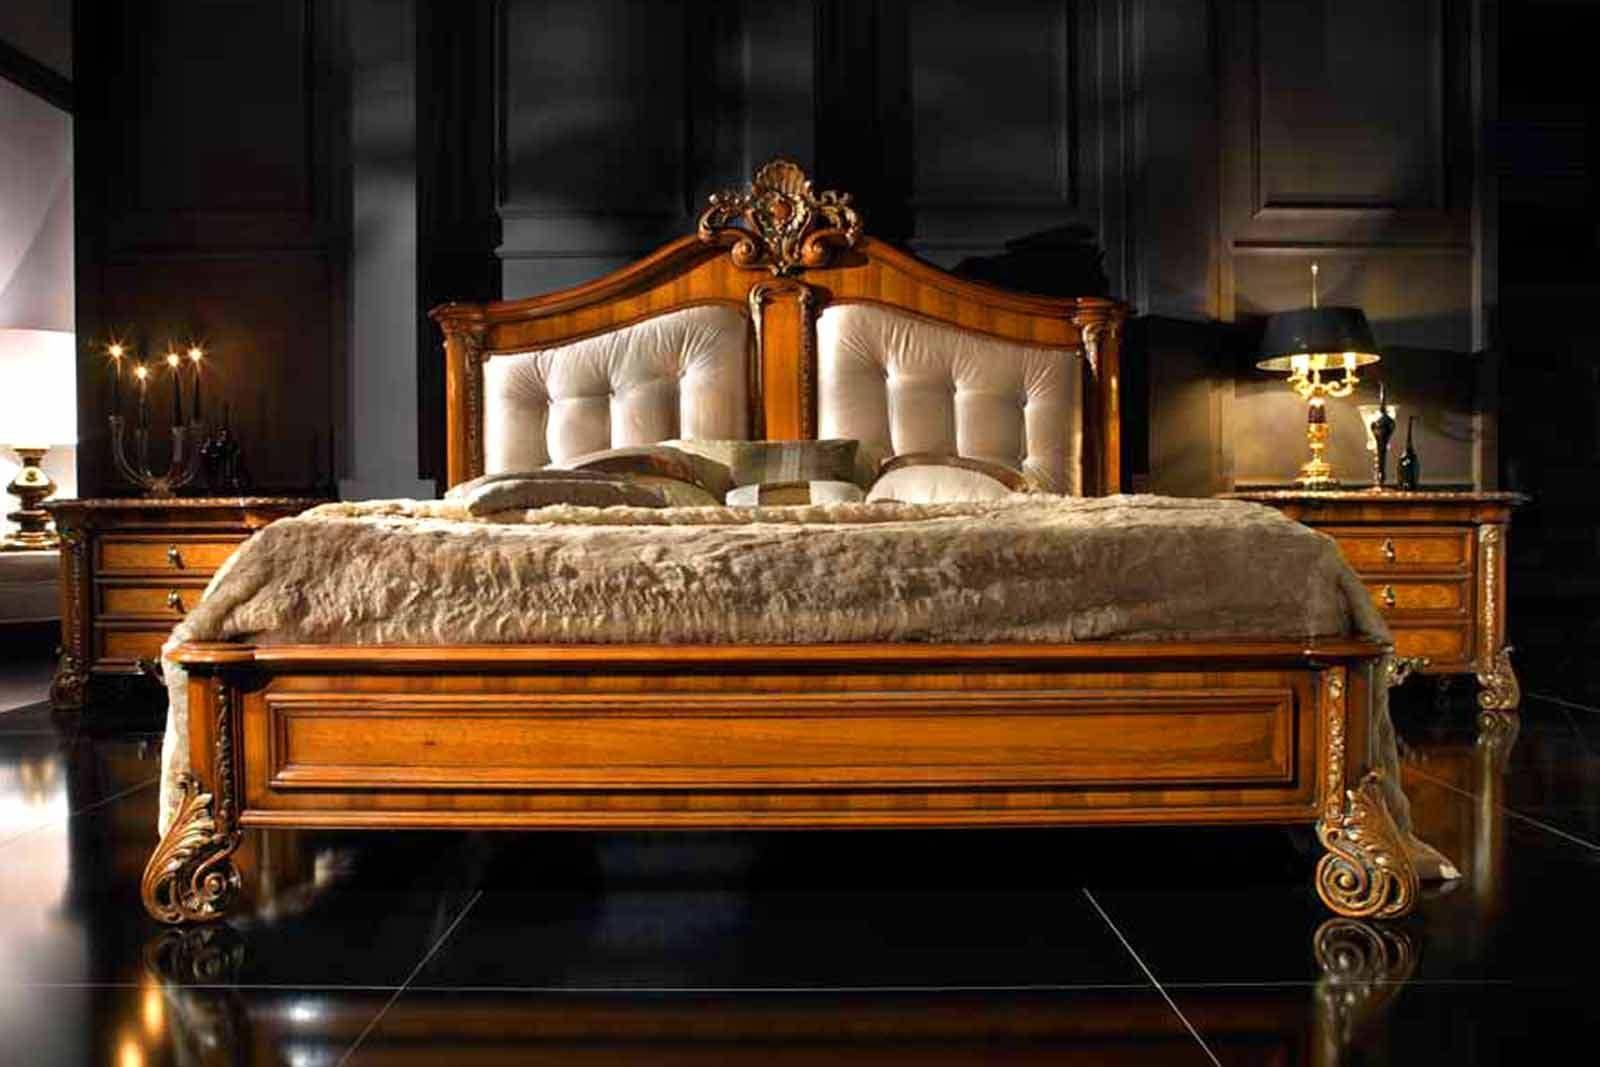 Glamorous Bedroom Furniture Luxury Bedroom Sets Luxury Bedroom Furniture Italian Bedroom Furniture Luxury italian bedroom furniture